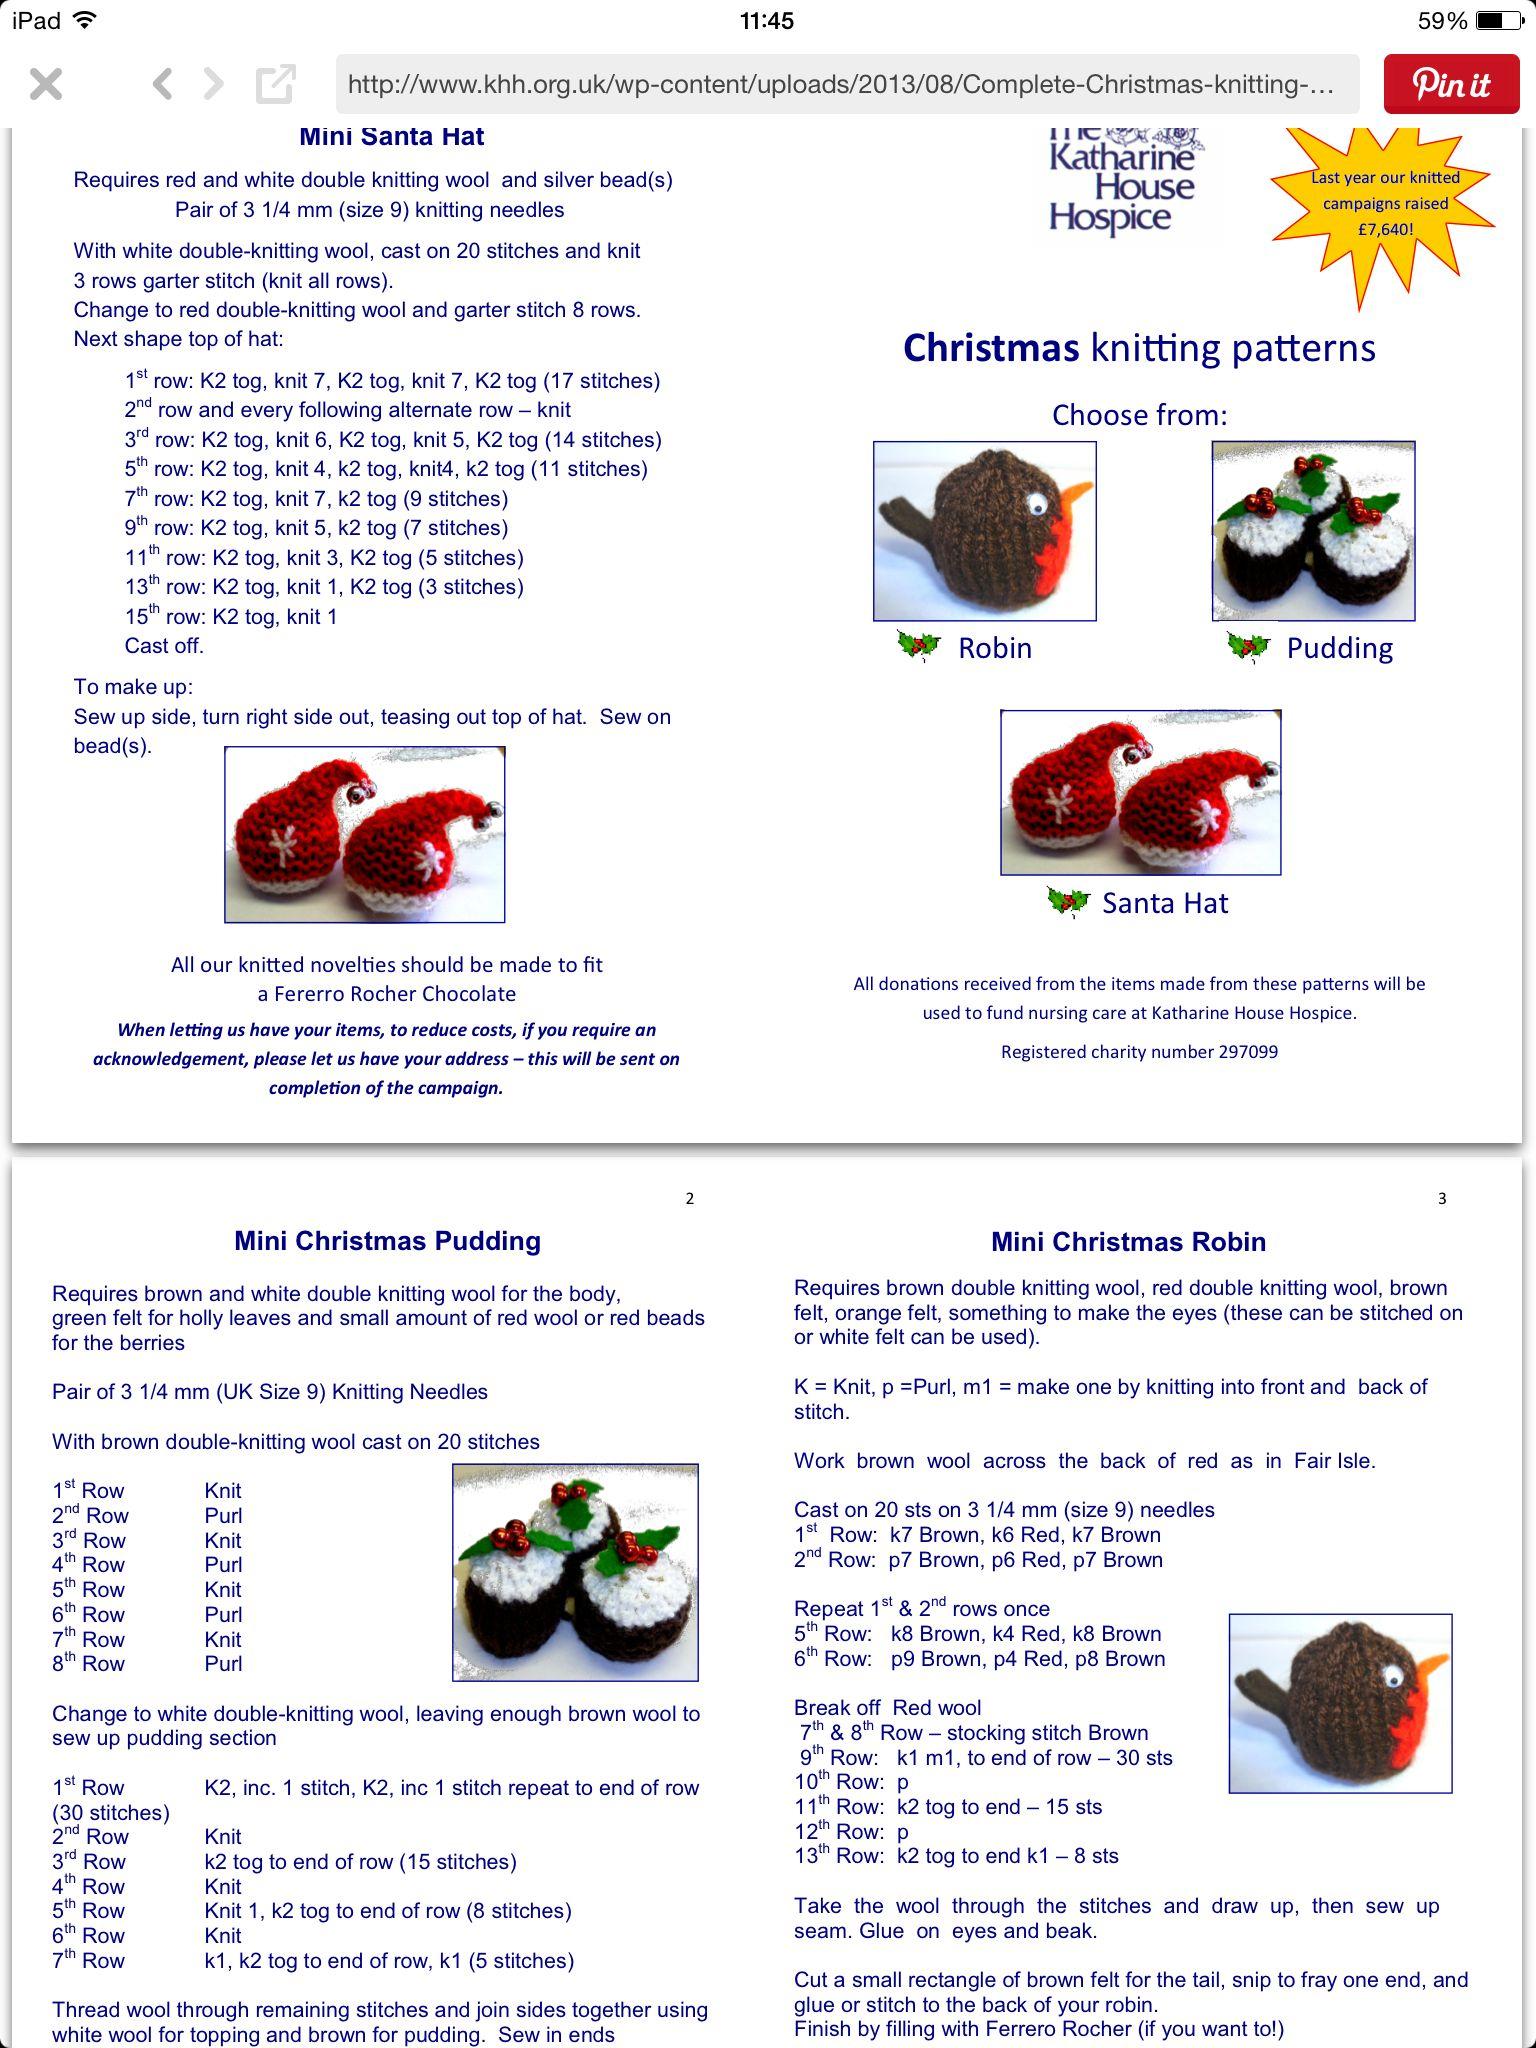 Ferrero Rocher jackets | Christmas knitting patterns, Christmas knitting patterns free ...